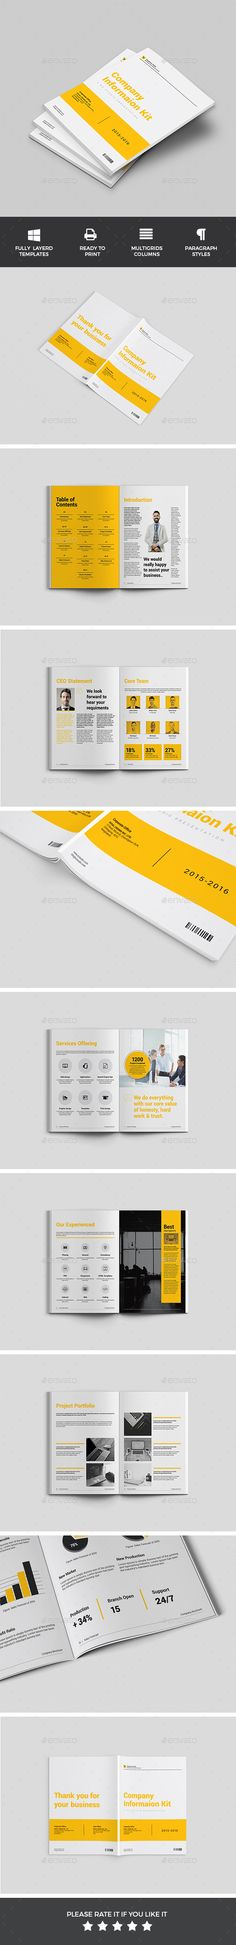 Brand Manual Brochures Design And Brochure Template